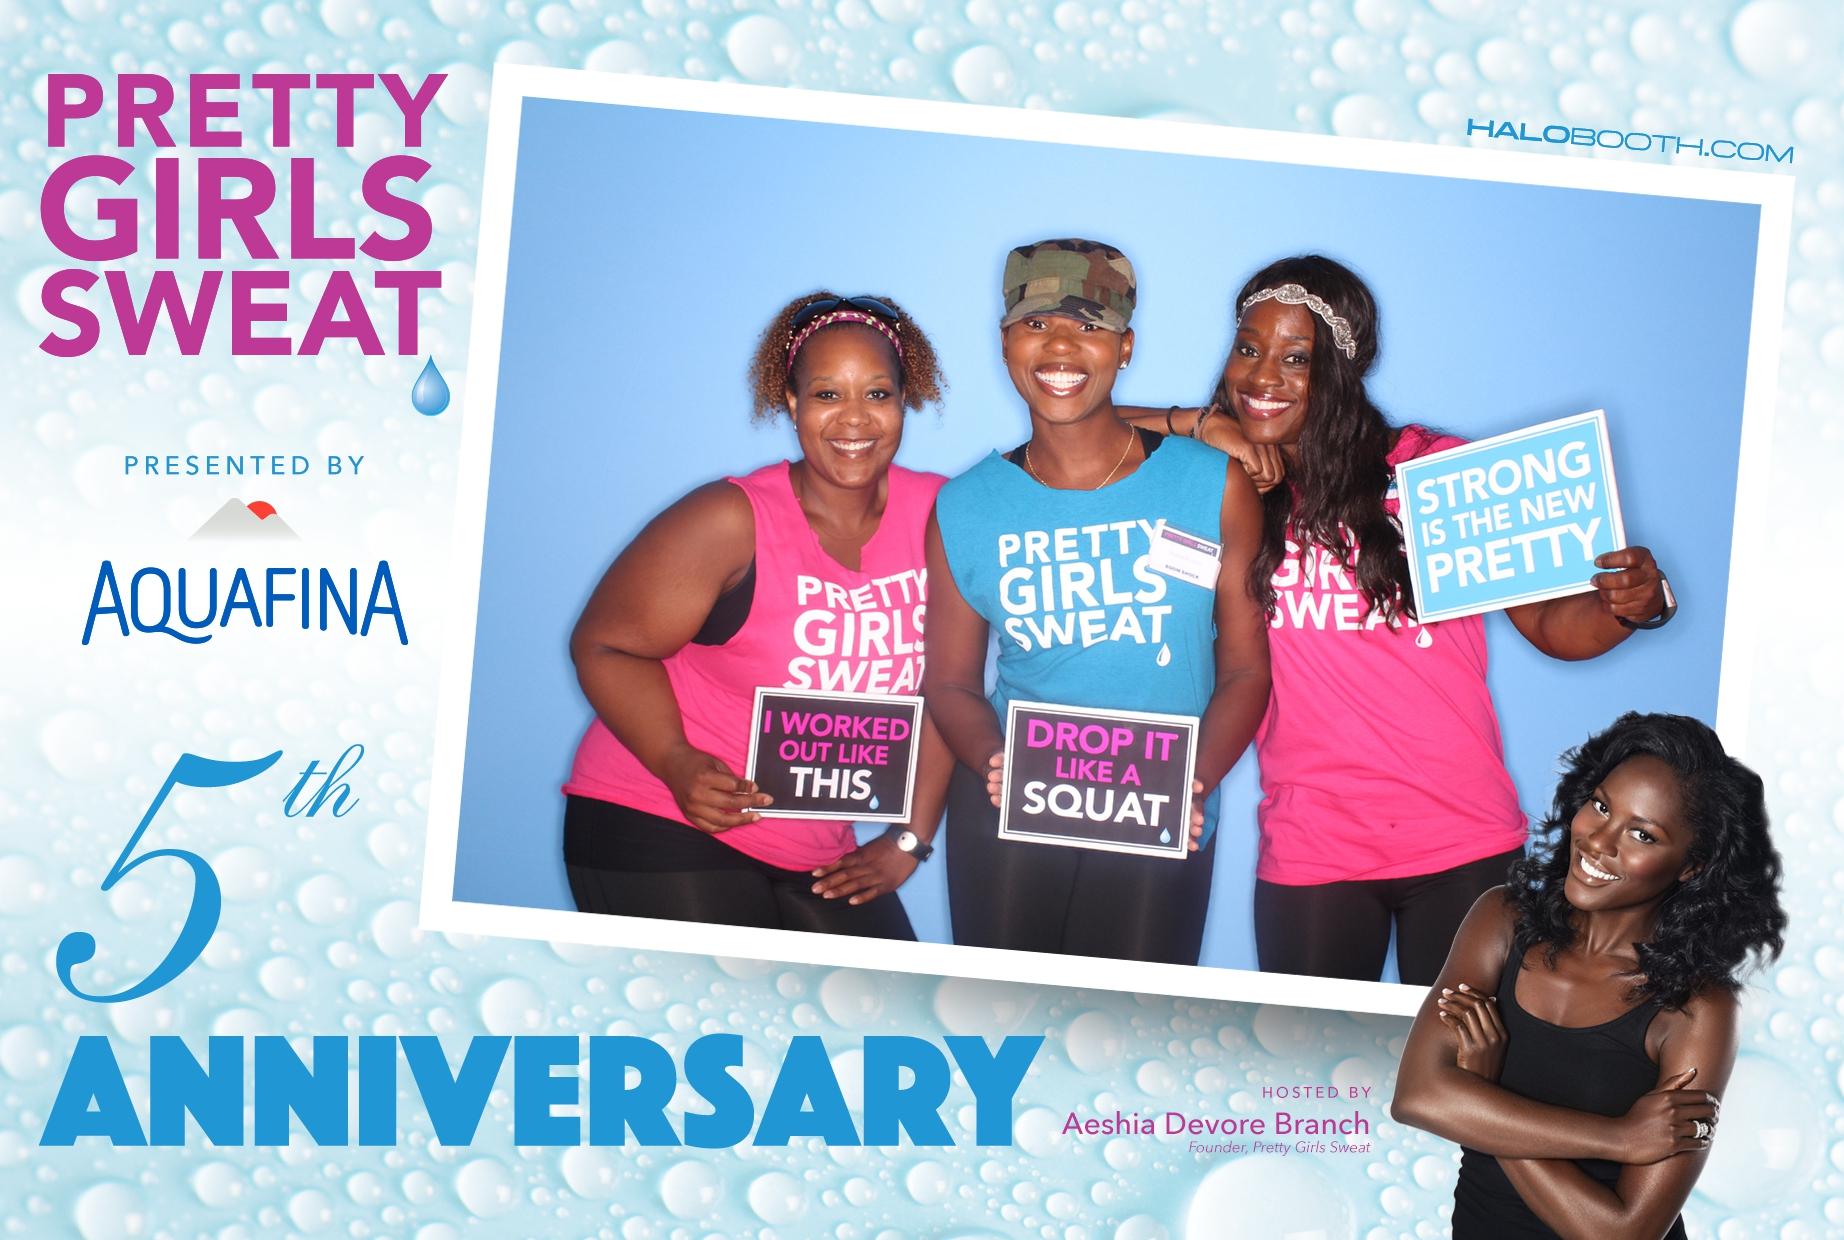 Pretty Girls Sweet 5th Anniversary - Presented by Aquafina